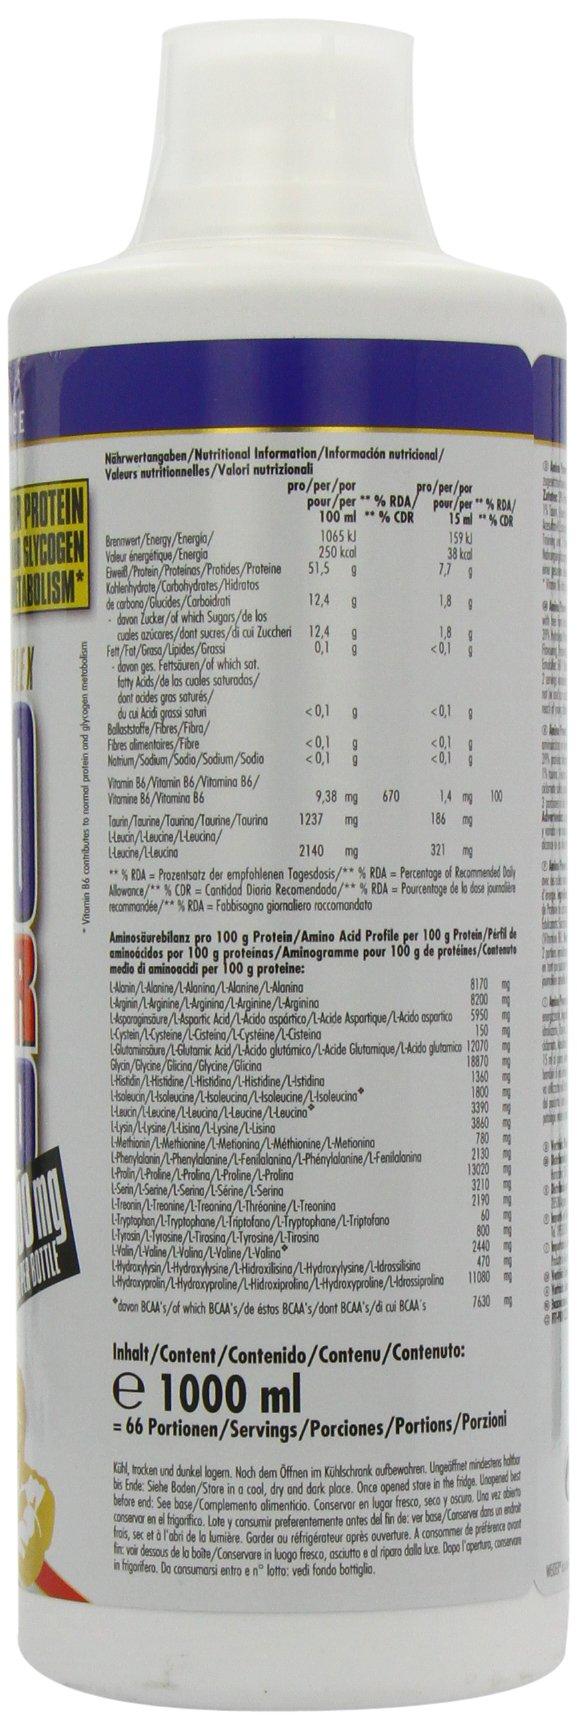 71lY3W2KDLL - Weider Amino Power Liquid 1L Energy, Essential Amino Acids, L-leucine, Free Taurine, Vitamin B8